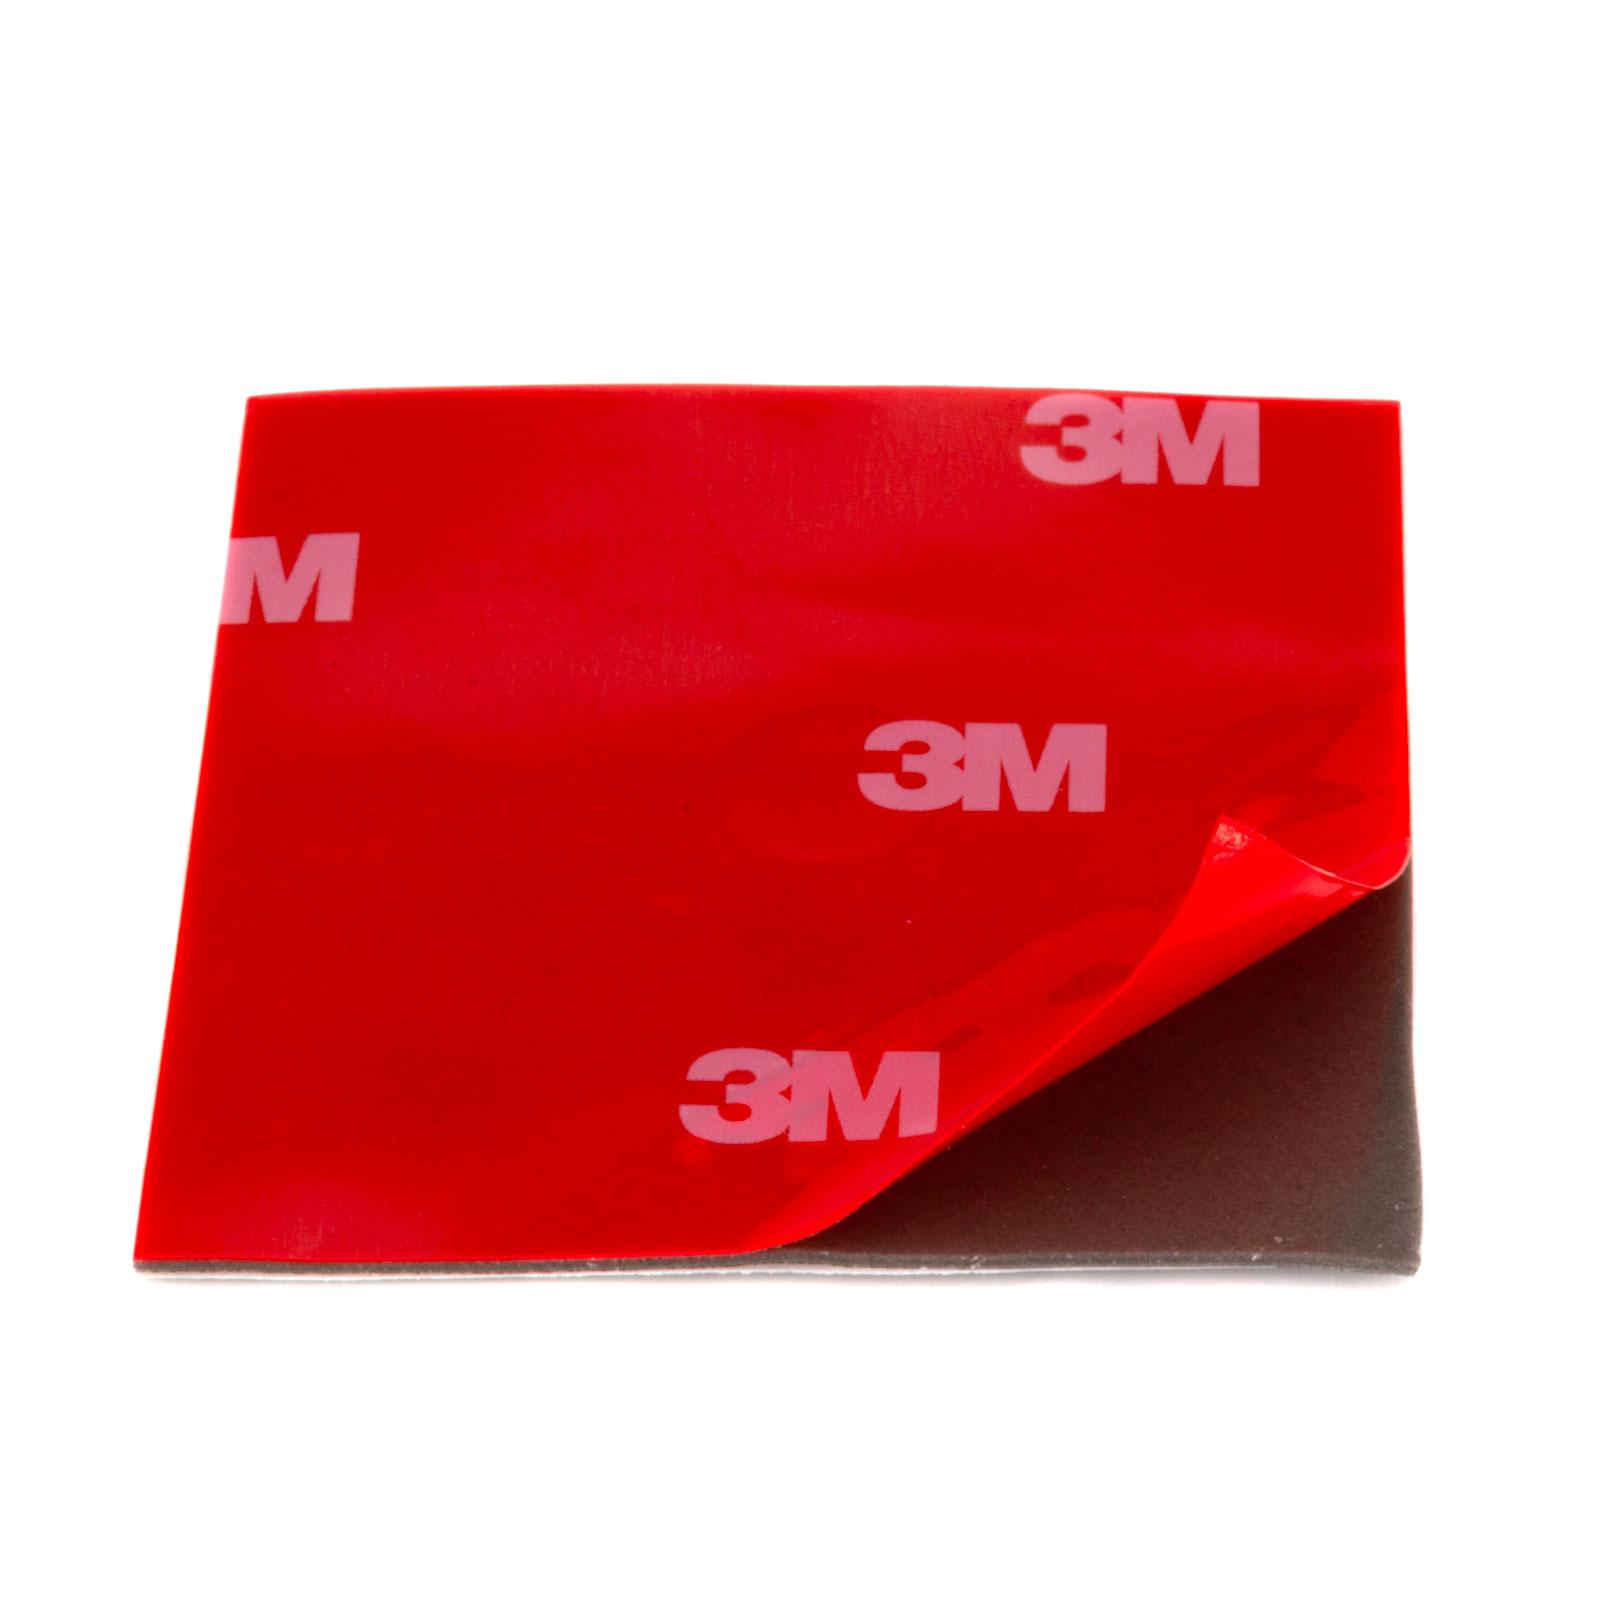 3M Klebepad Klebeband doppelseitig stark klebend 20 Klebestreifen grau 25x25mm